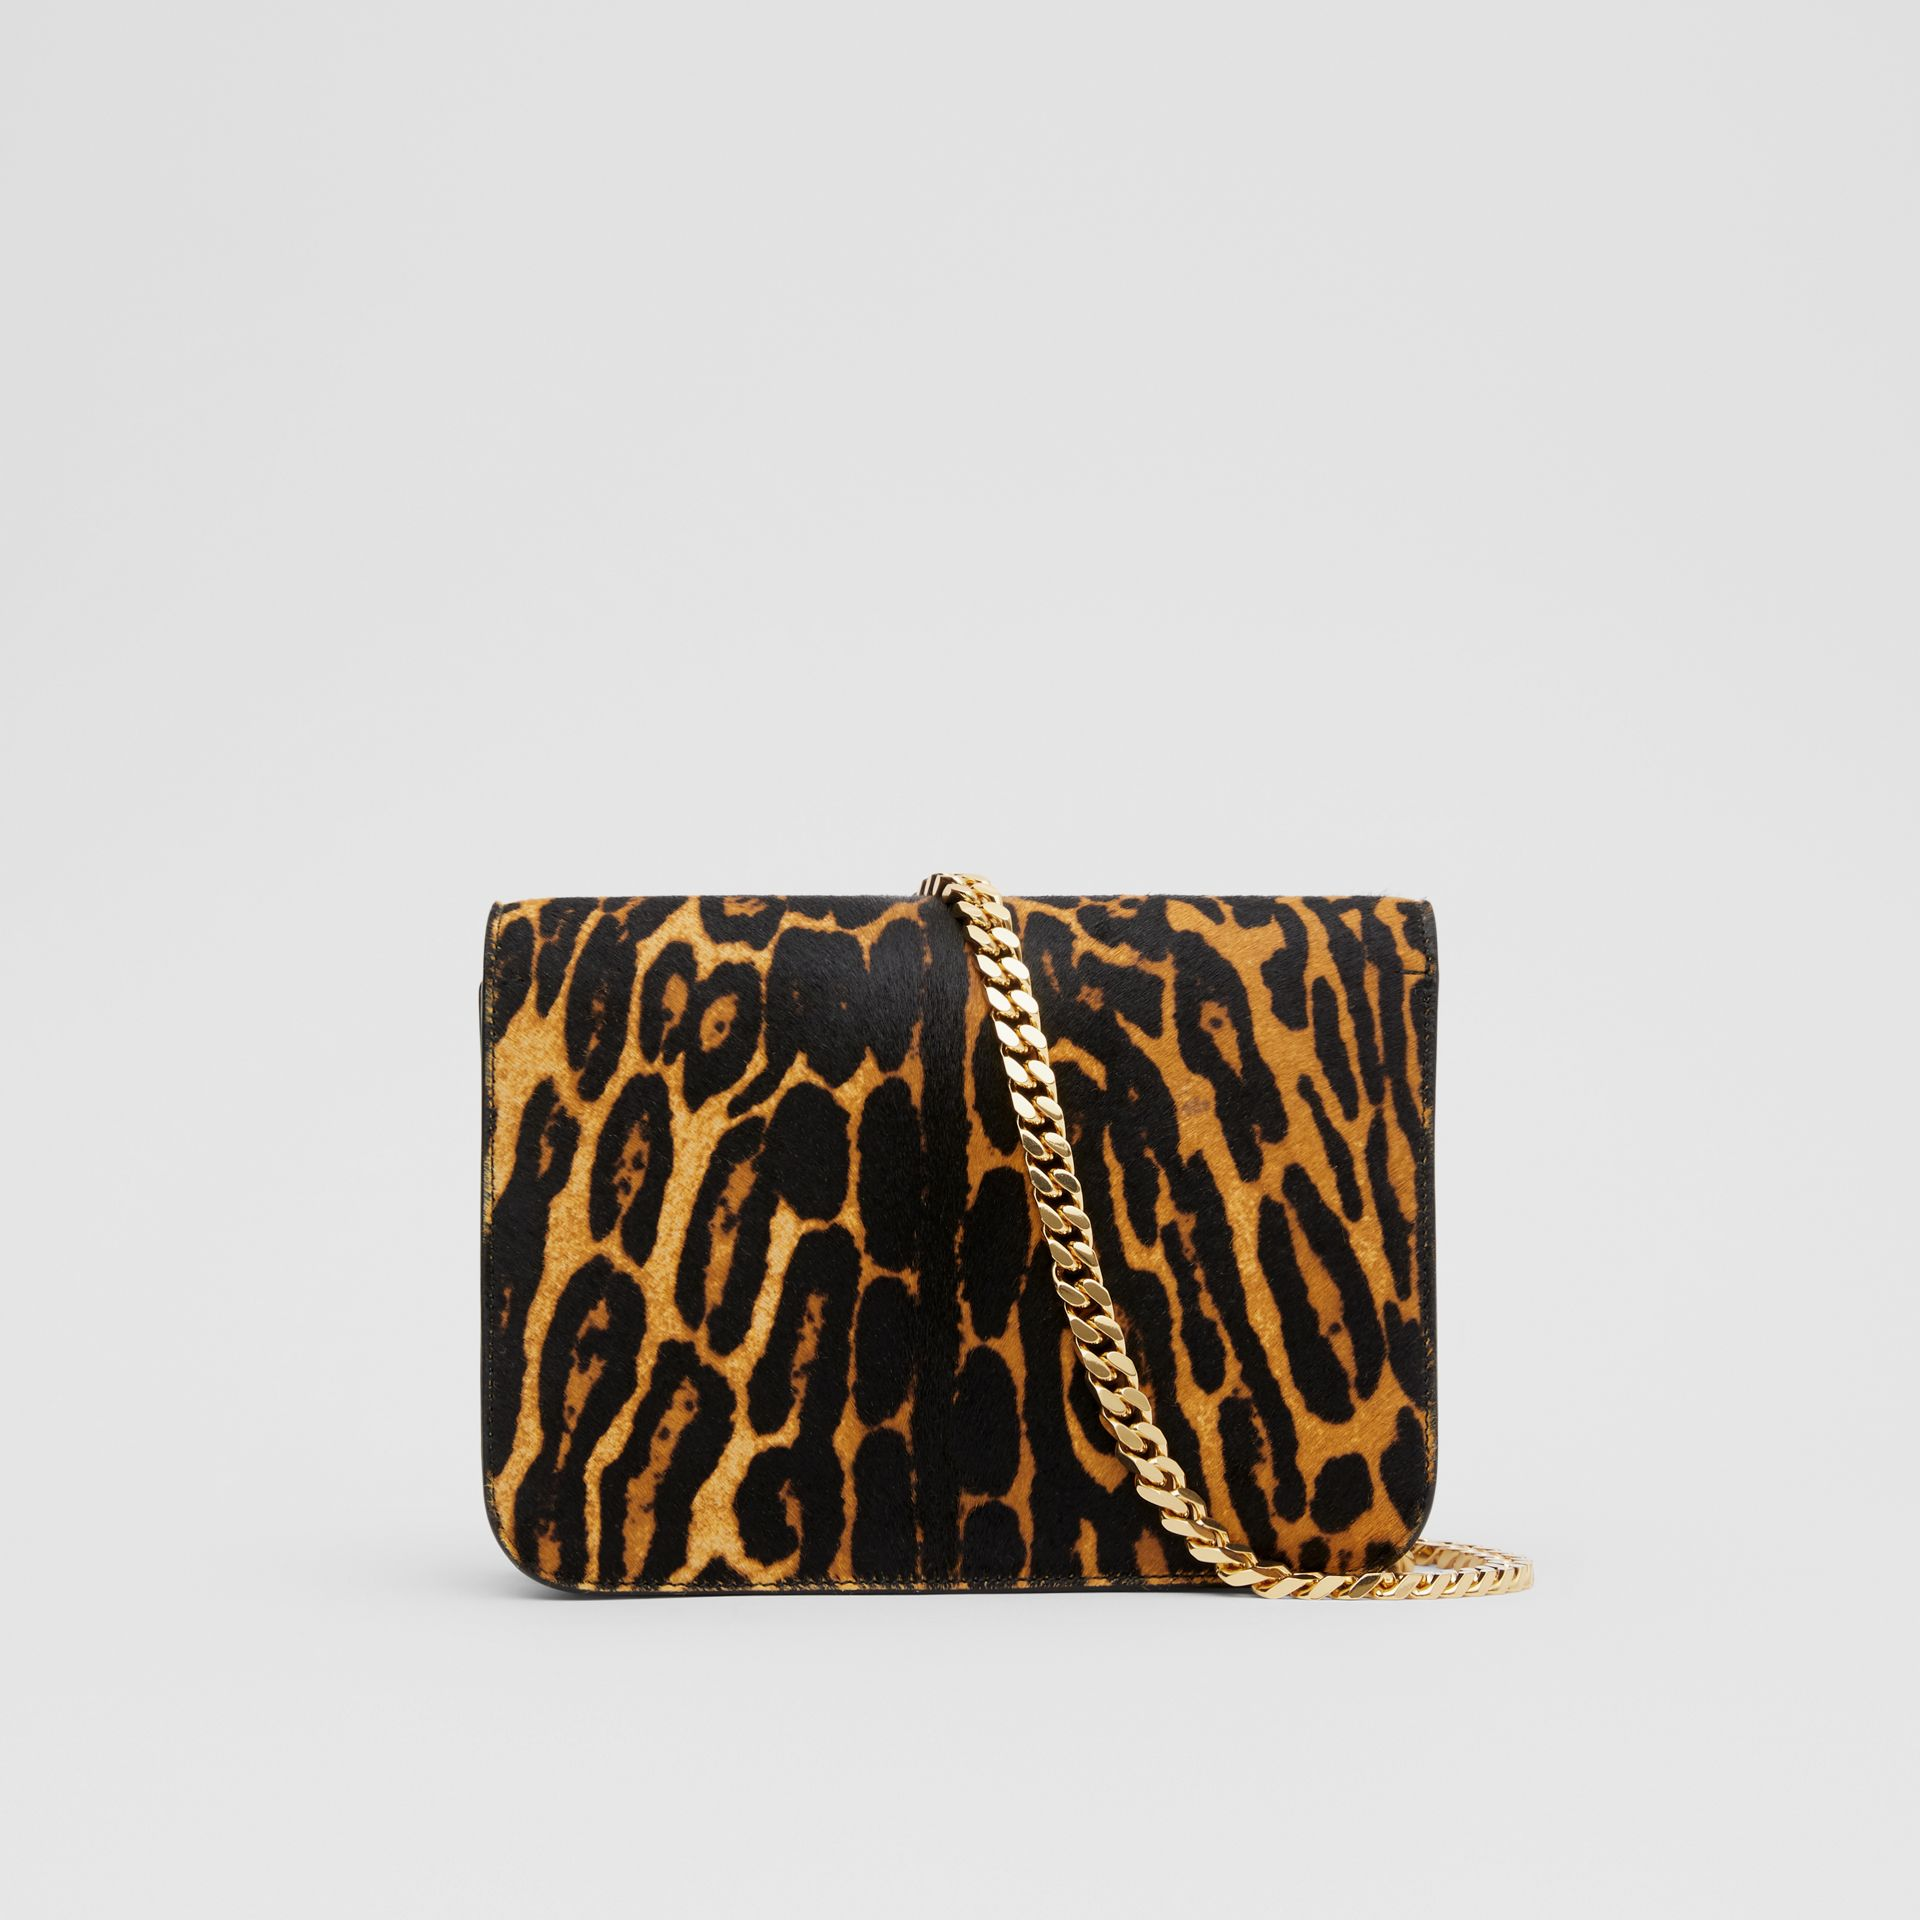 Small Leopard Print Calf Hair TB Bag in Dark Mustard - Women | Burberry Hong Kong S.A.R - gallery image 7